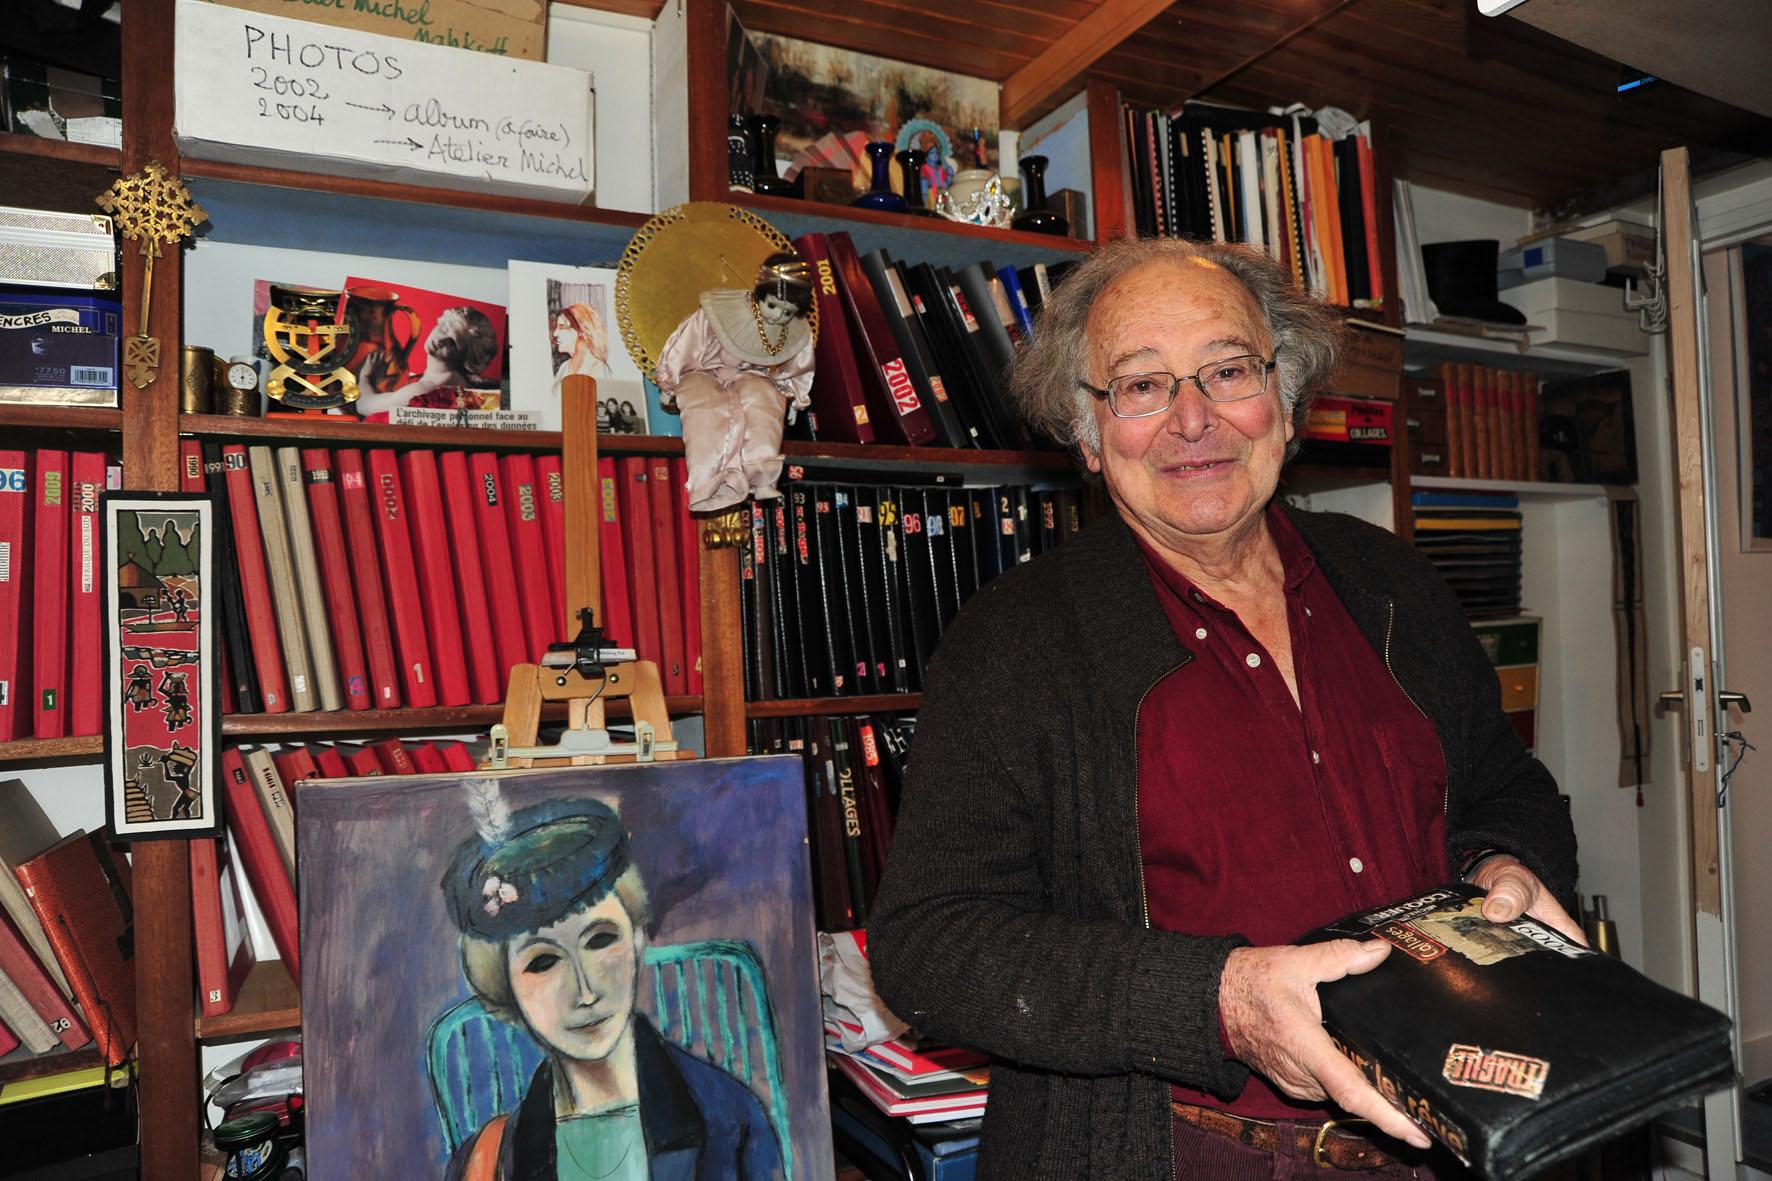 Michel Coquery dans son atelier || Michel Coquery in his artist's studio